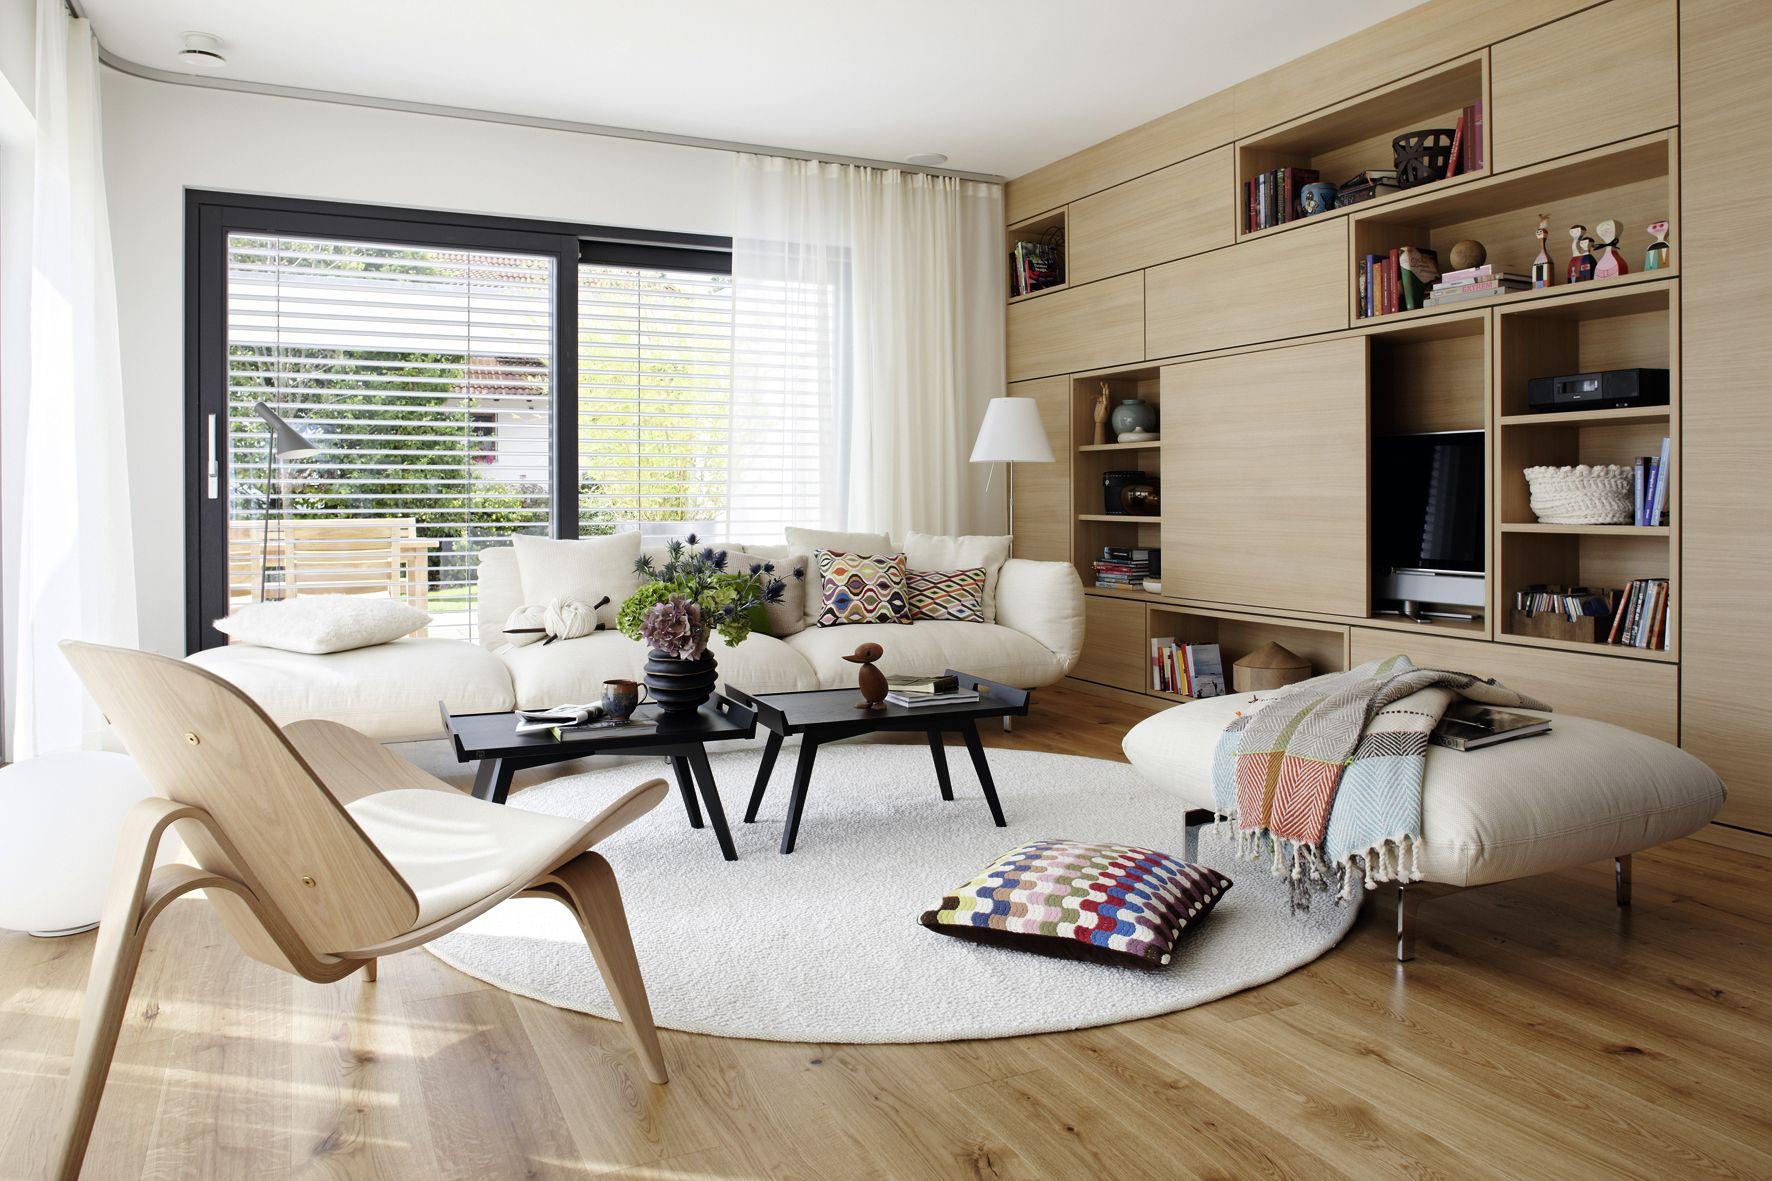 10 idei si exemple de amenajare pentru living adela p rvu jurnalist home garden. Black Bedroom Furniture Sets. Home Design Ideas